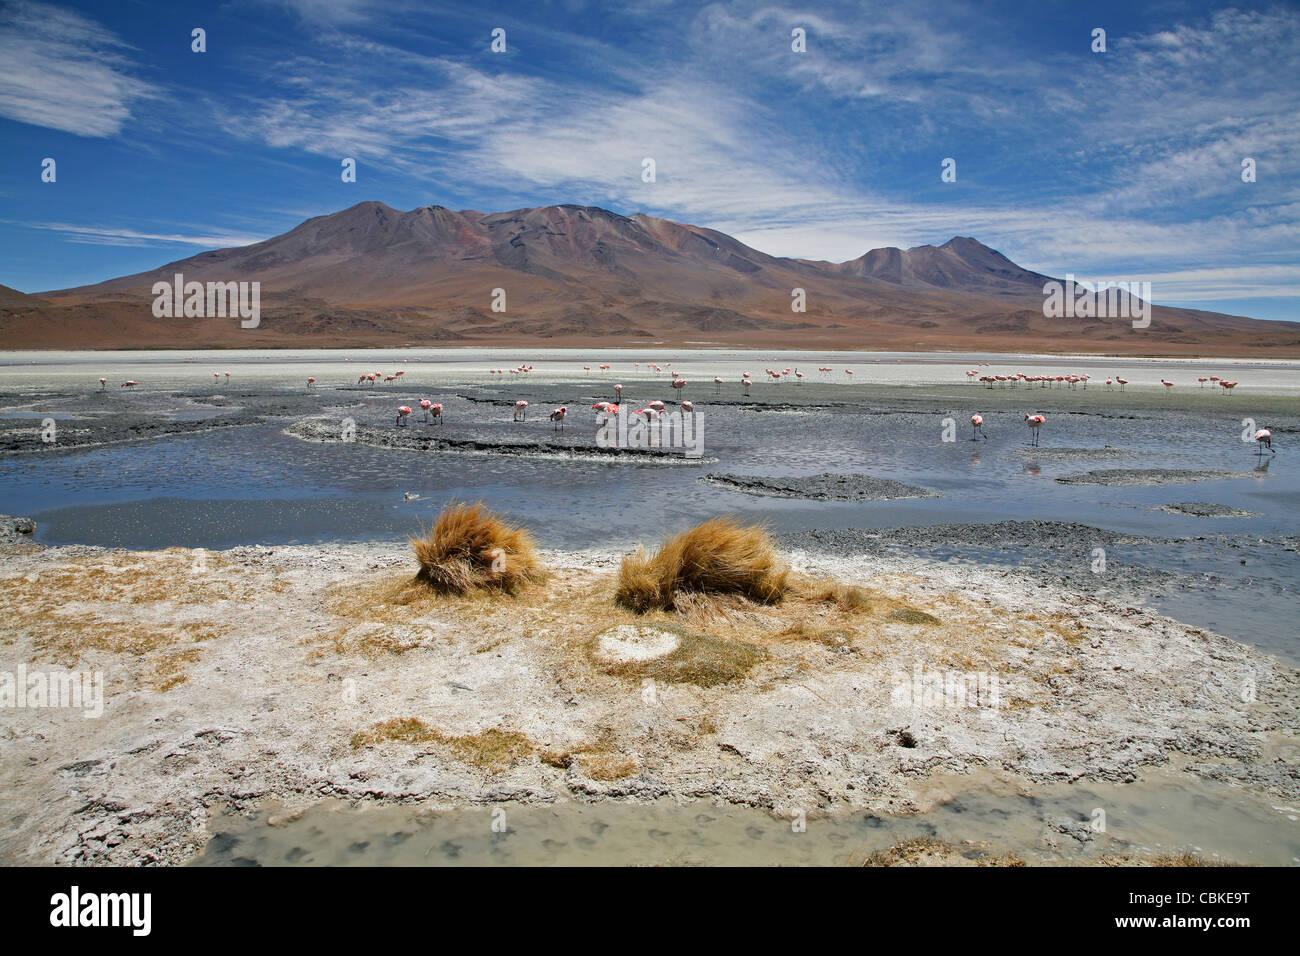 Puna / James's Flamingos (Phoenicoparrus jamesi) in the salt lake Laguna Hedionda on the Altiplano, Bolivia Stock Photo